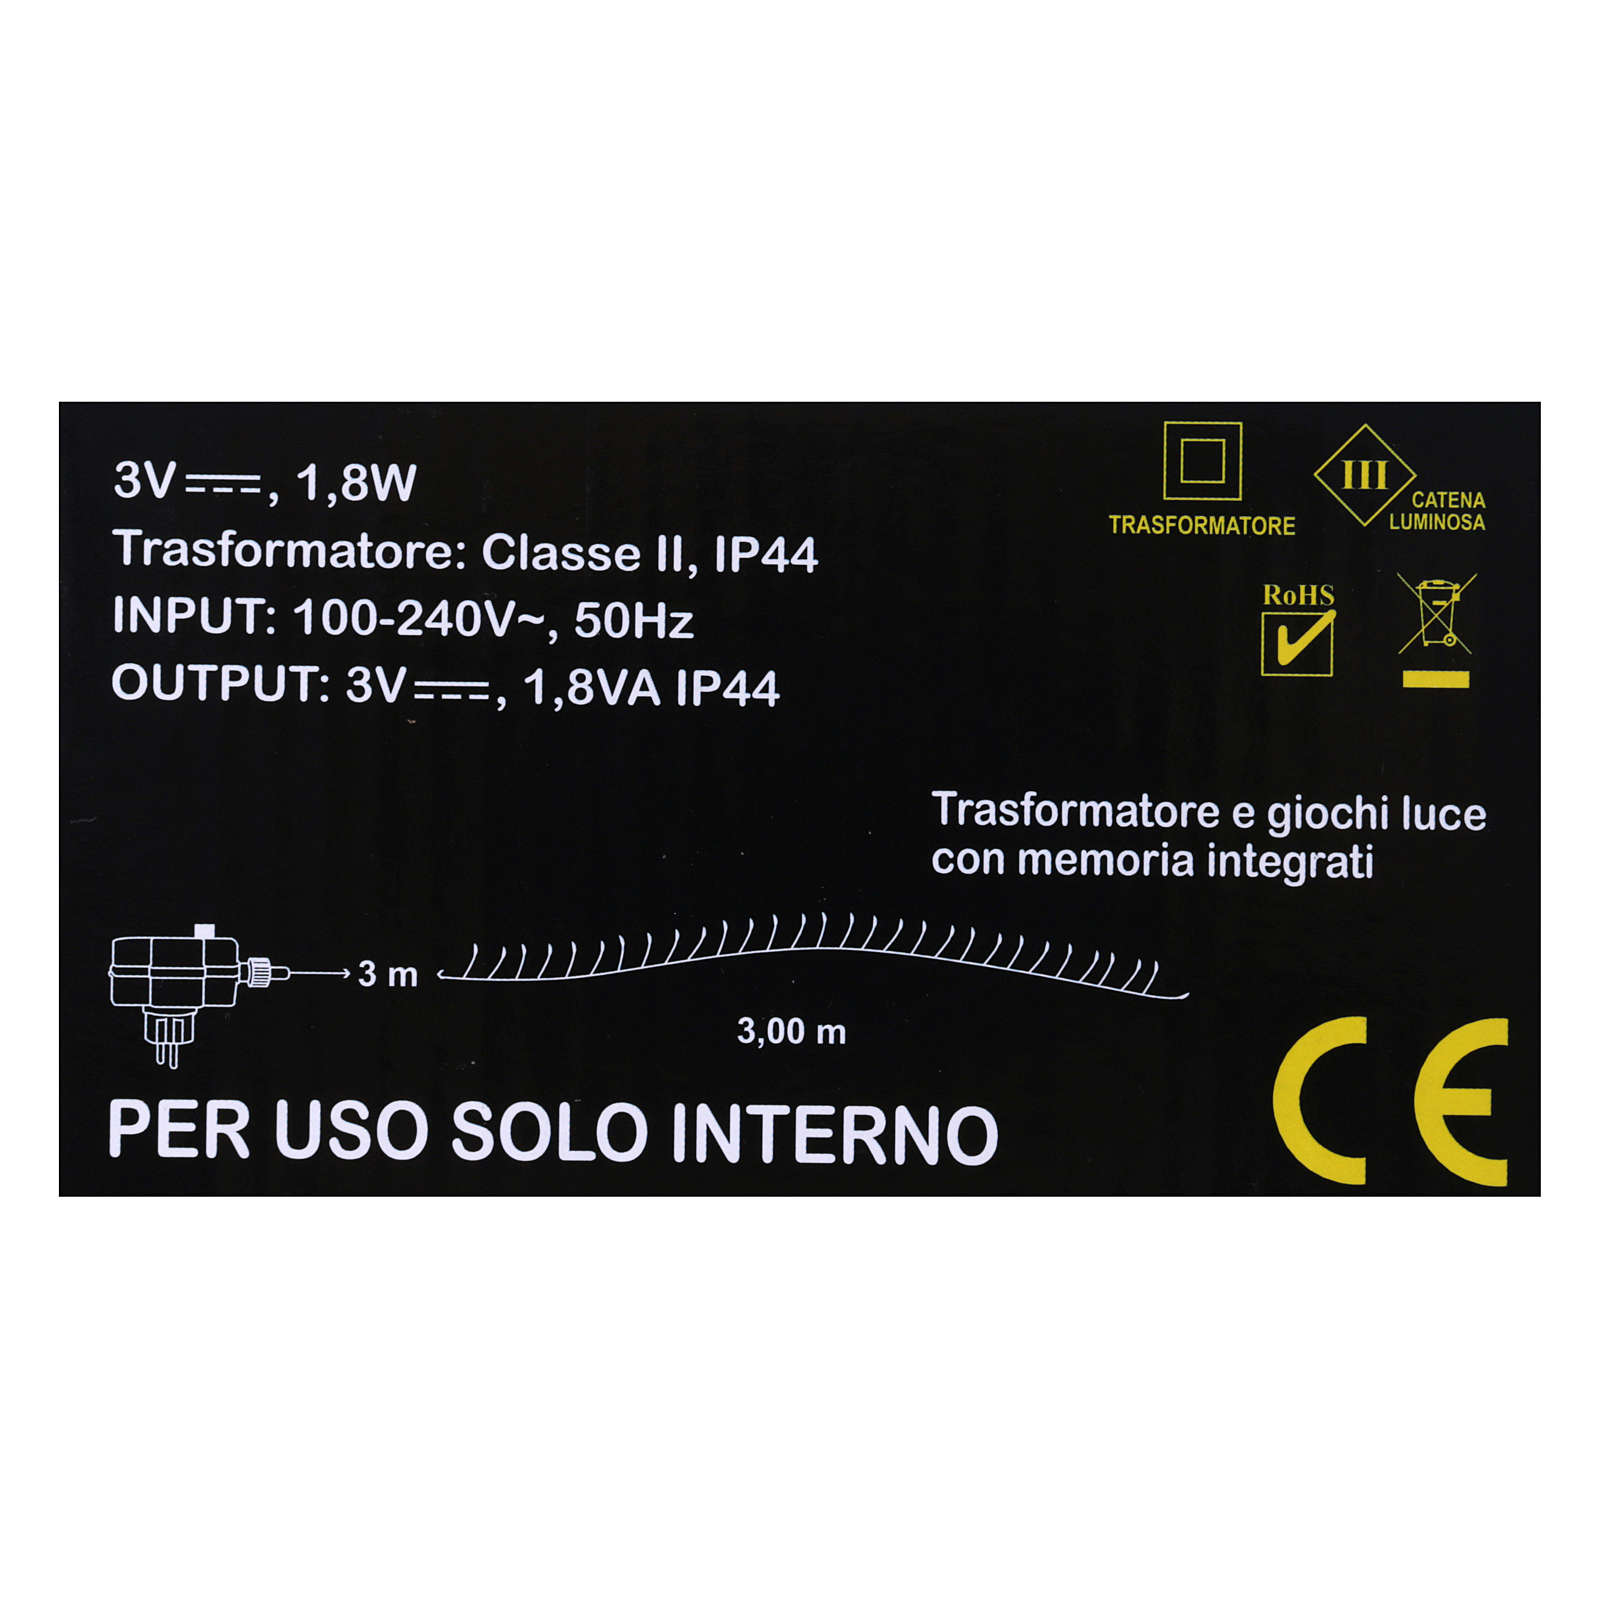 Bare wire light cable 100 warm white nano leds internal use 3